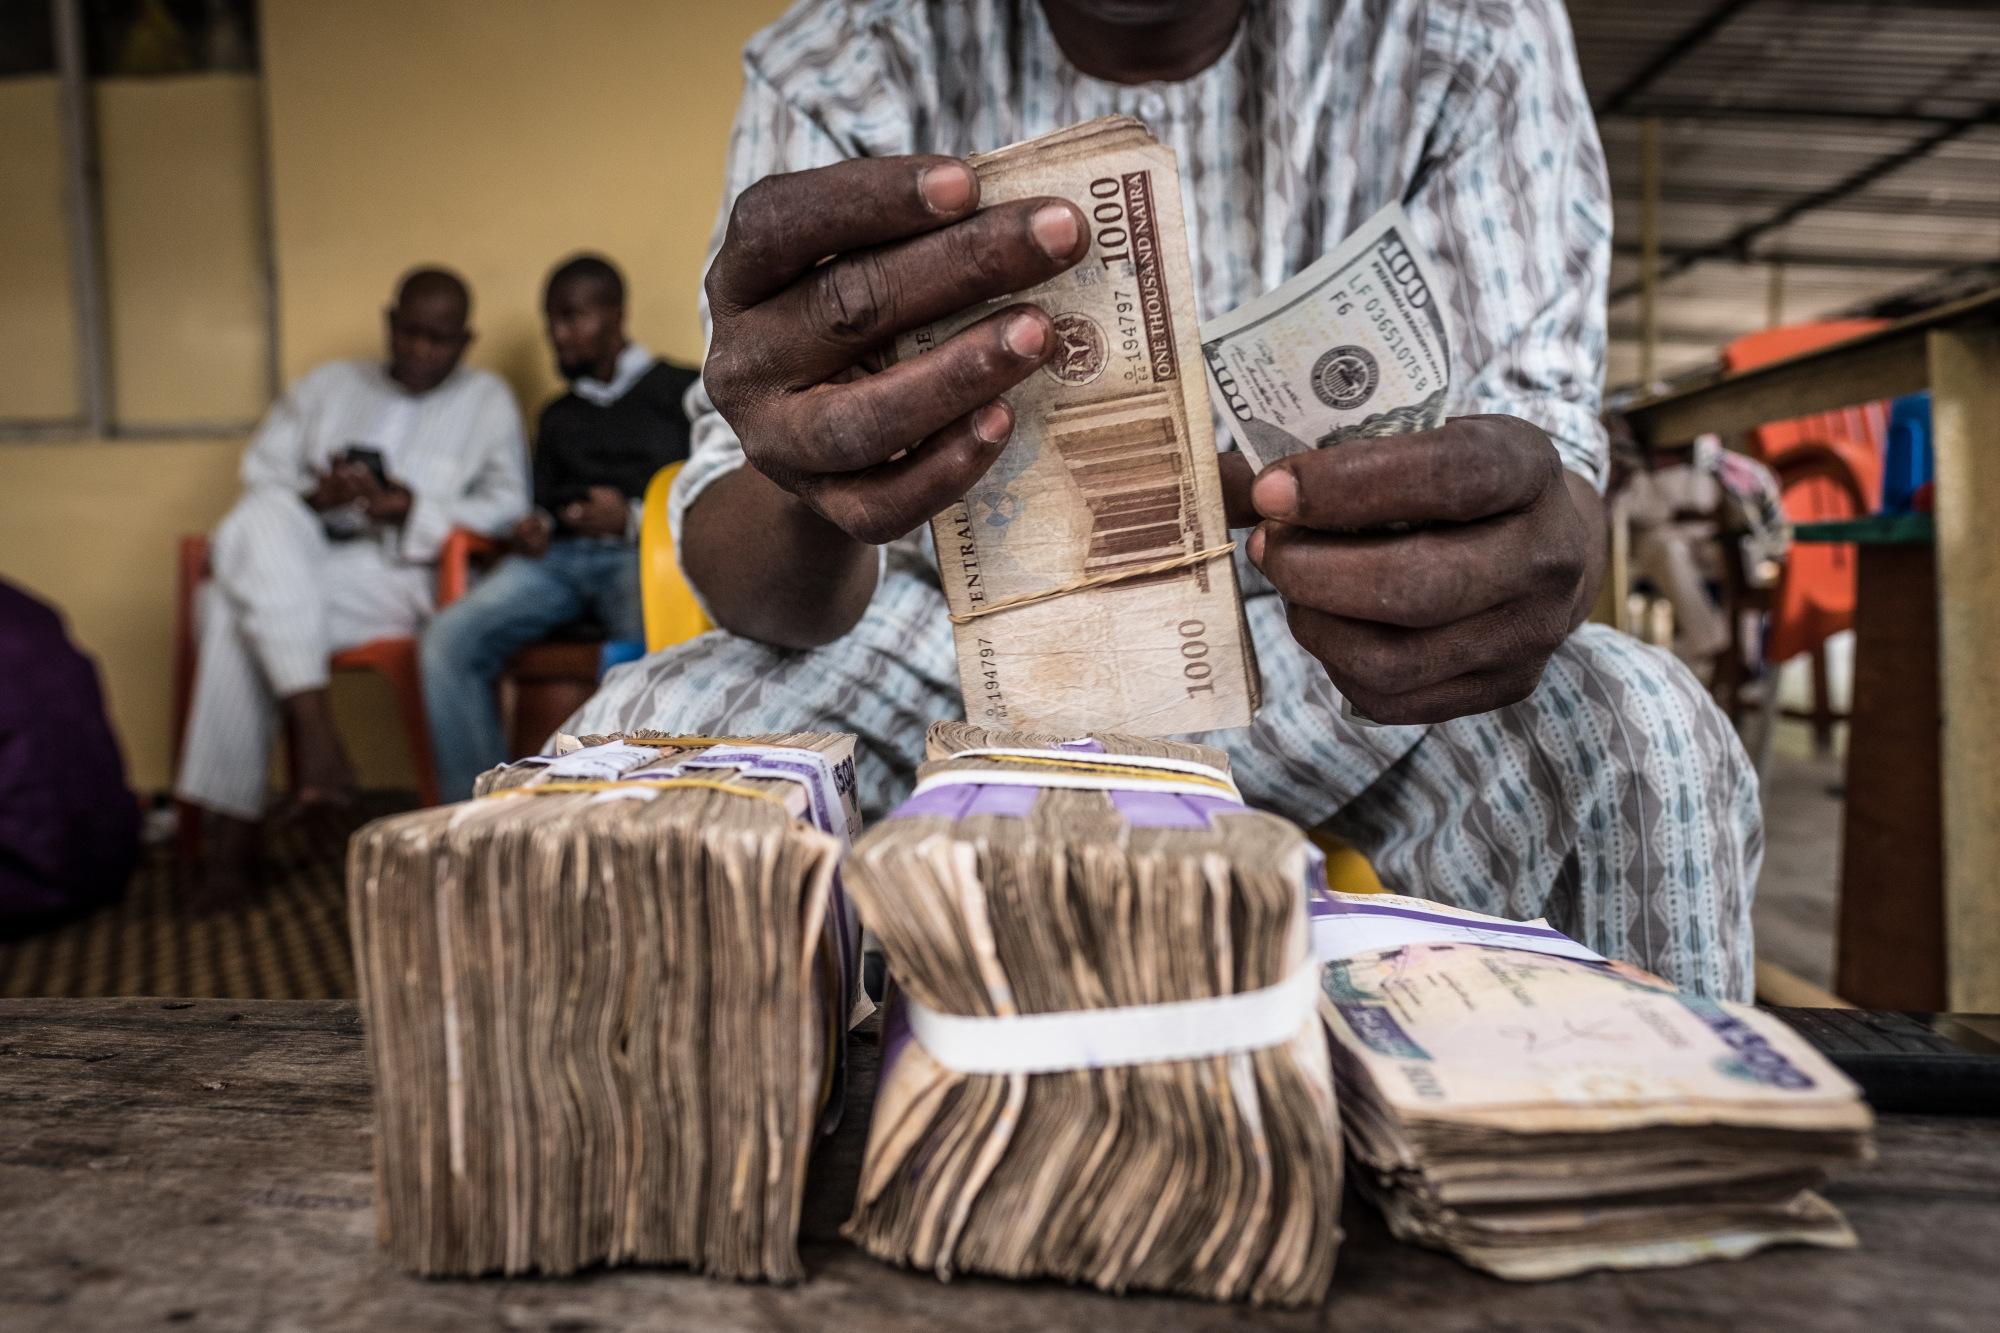 bloomberg.com - Yinka Ibukun - Nigerians Bury Cash in Backyard Banks as Mobile Money Stumbles